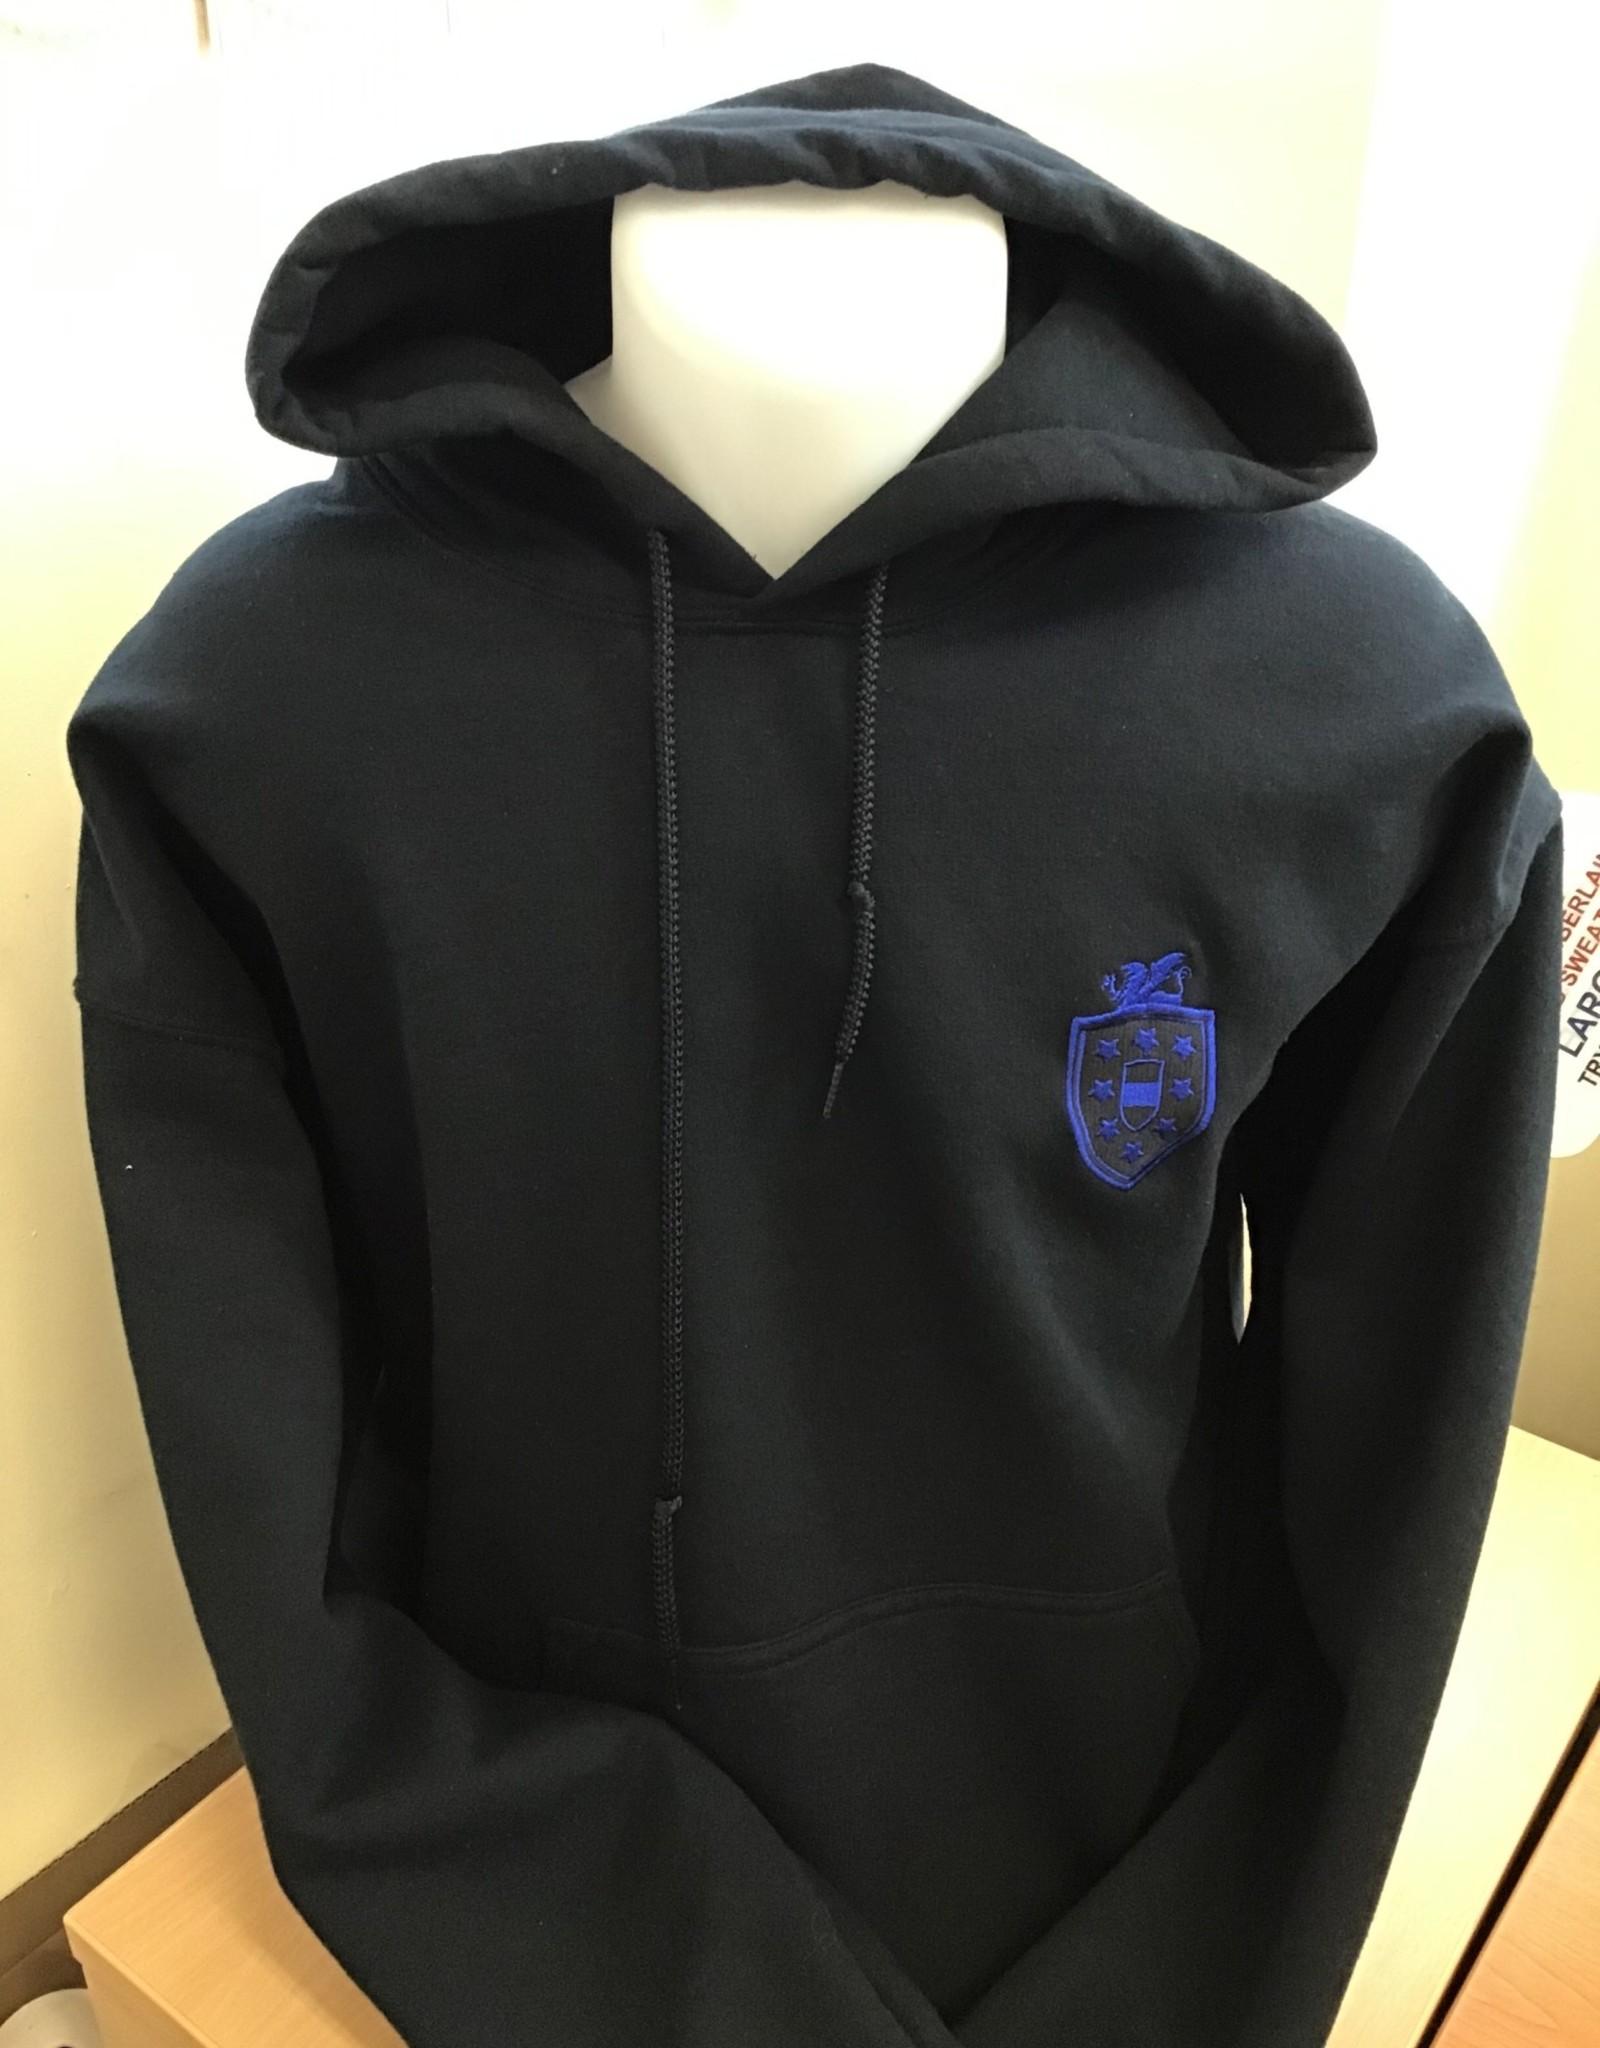 GILDAN P.E. Hooded Sweatshirt Adult Size - Nicholas Chamberlaine School